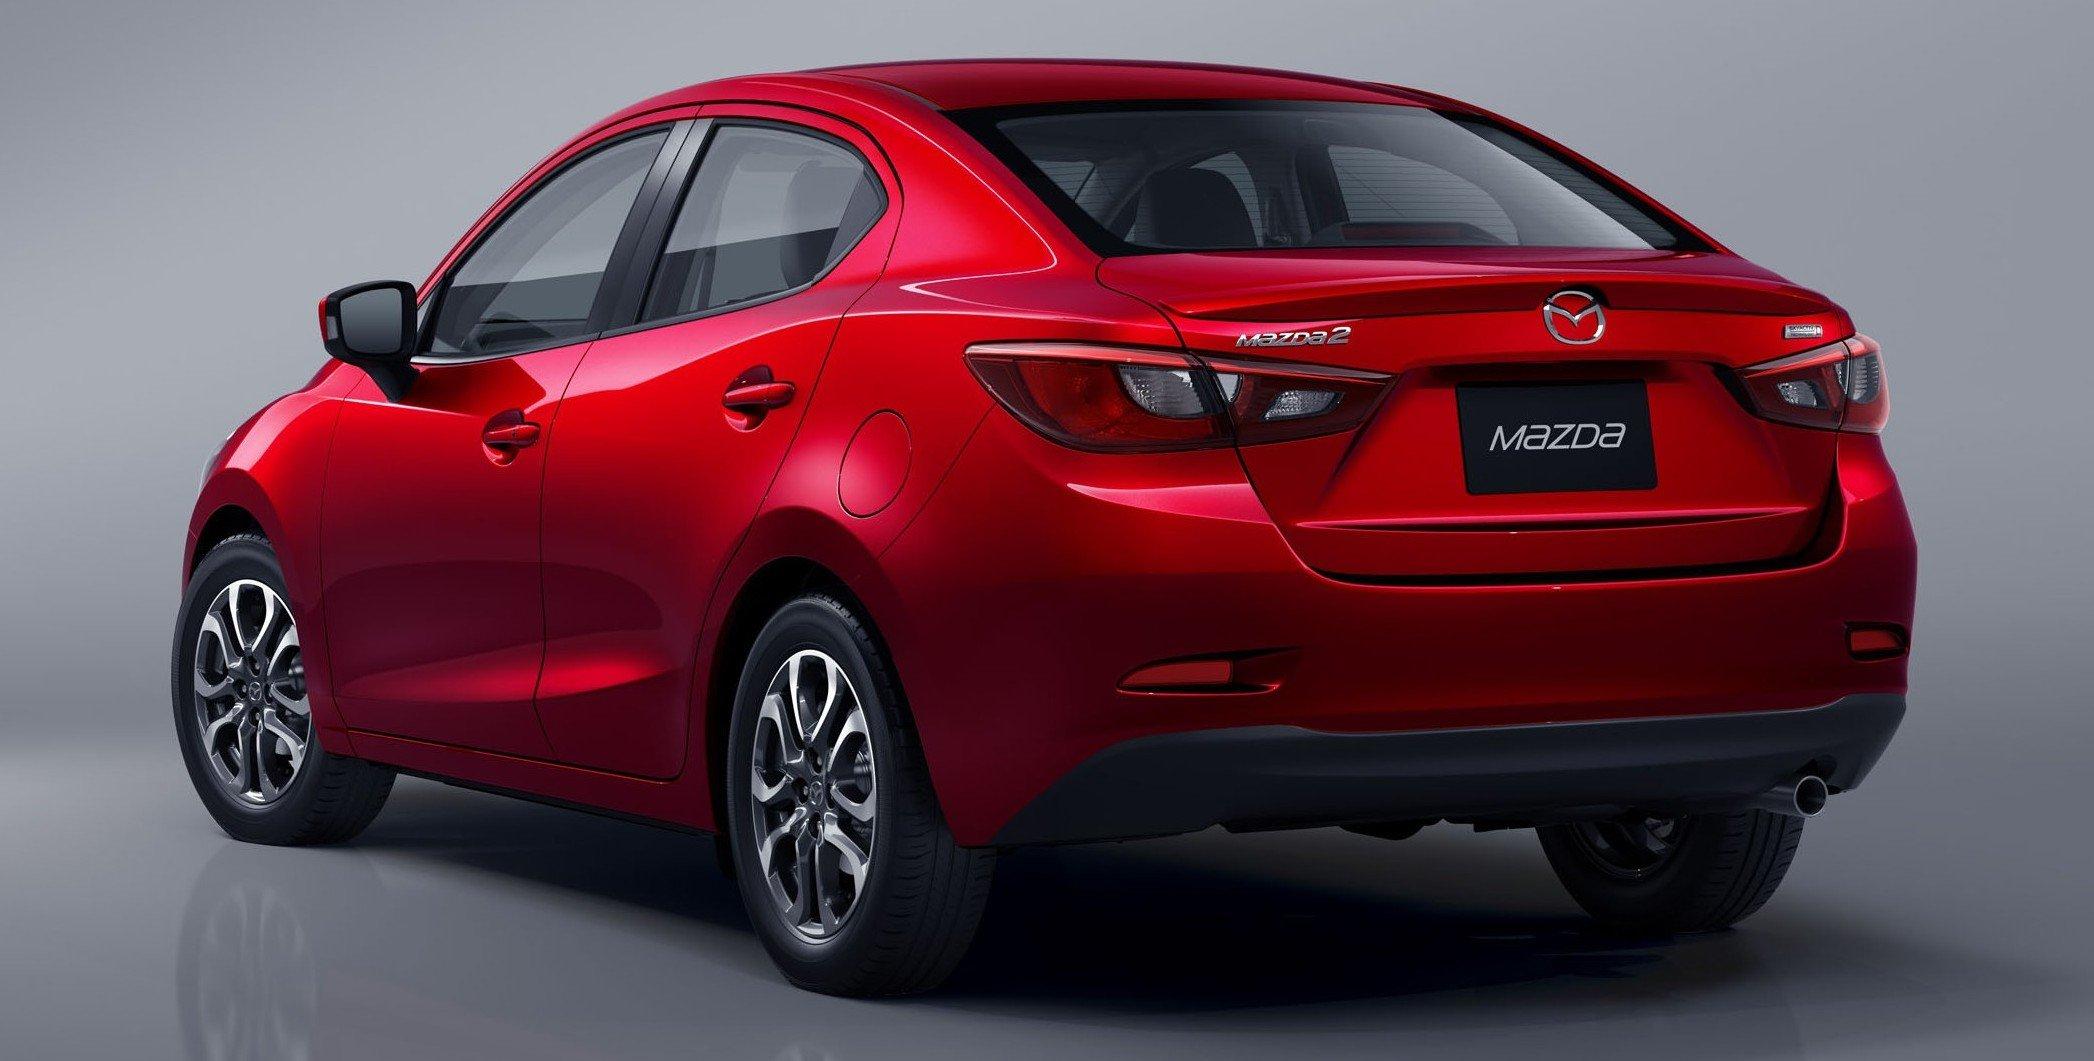 Mazda 2 Sedan First Photos Out Full Reveal Next Week Paul Tan Fuse Box On Image 290184